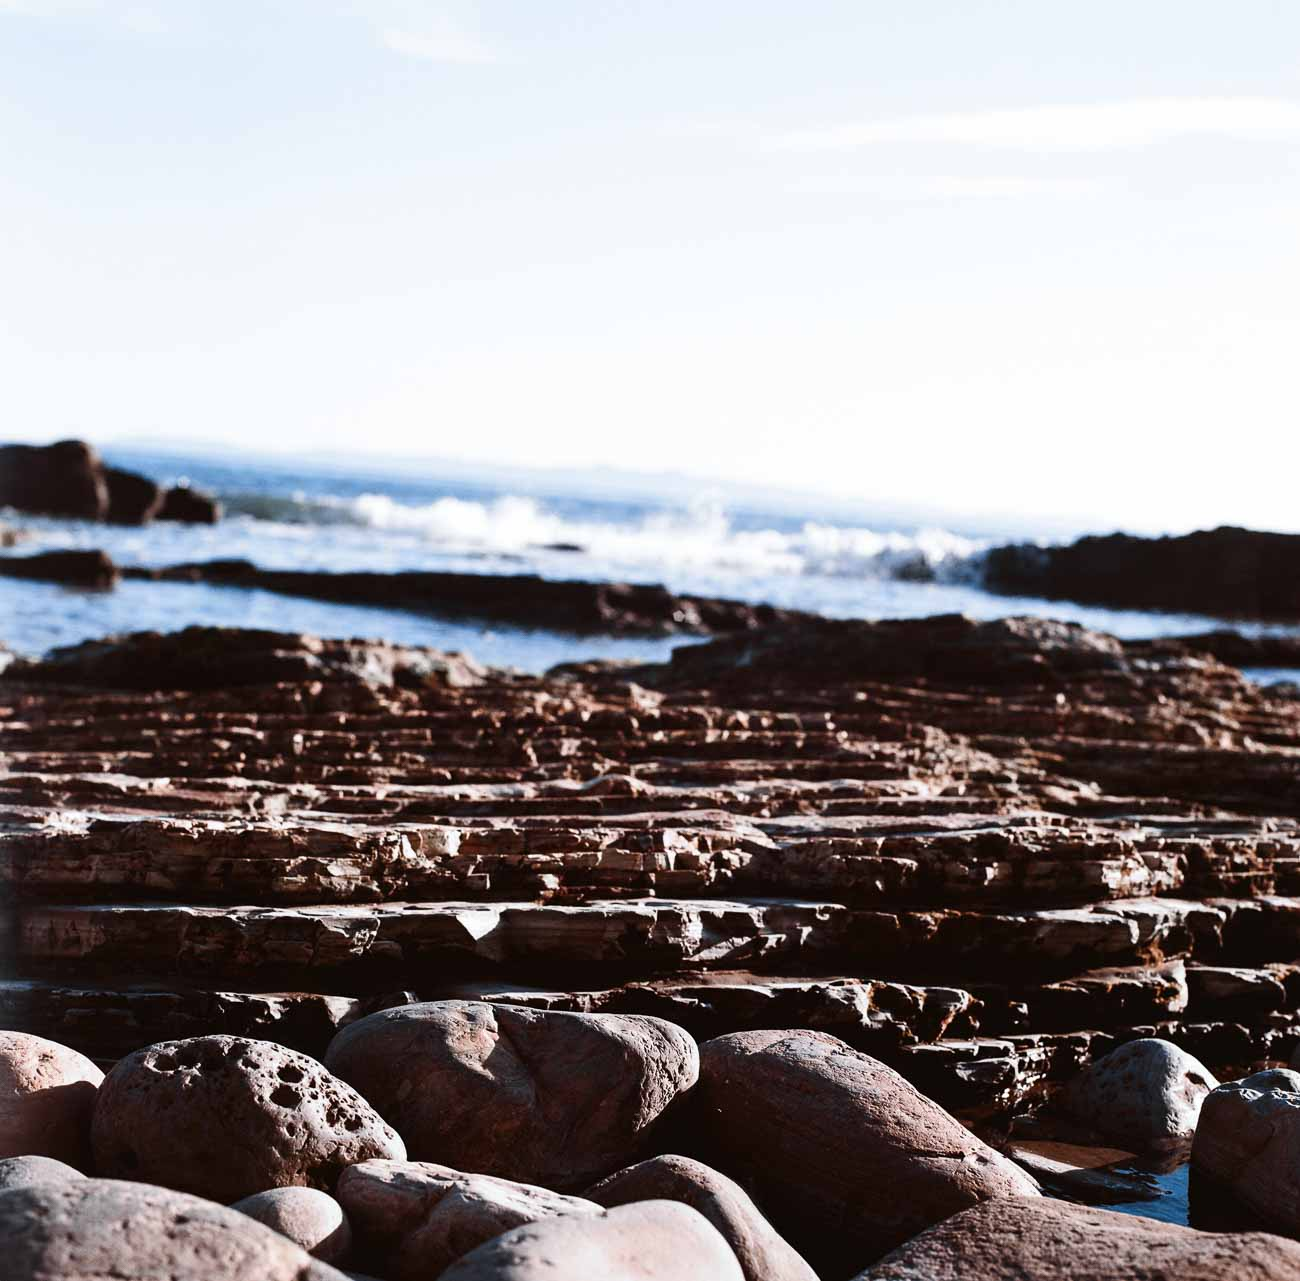 Rocks on a beach in San Pedro, CA, photographed with a Hasselblad 500c and Kodak Ektar